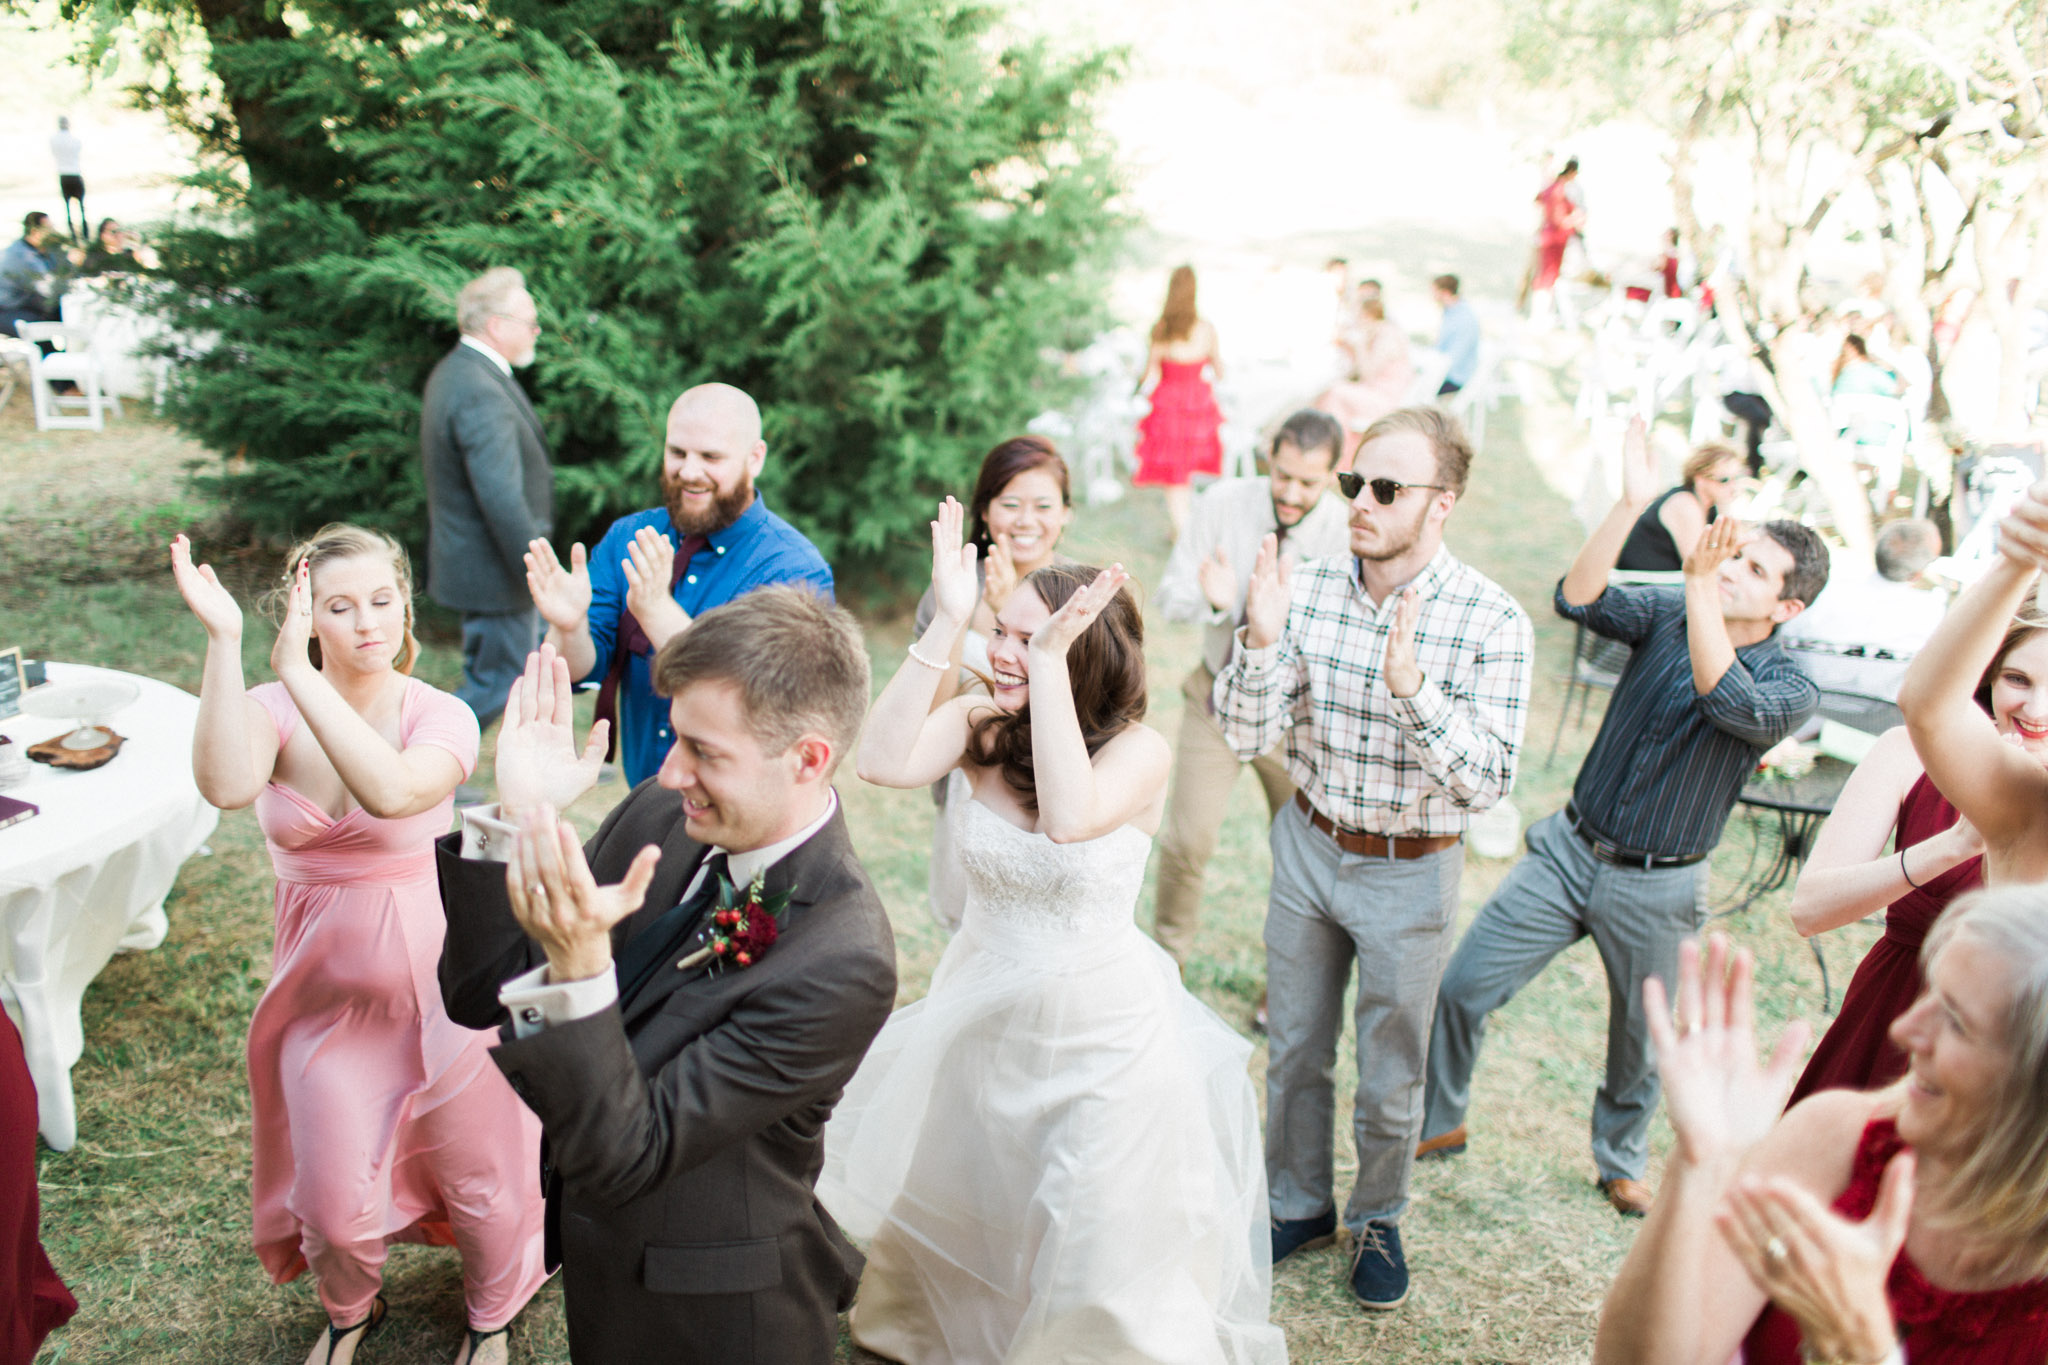 sanger_texas_wedding_photographer-44.jpg